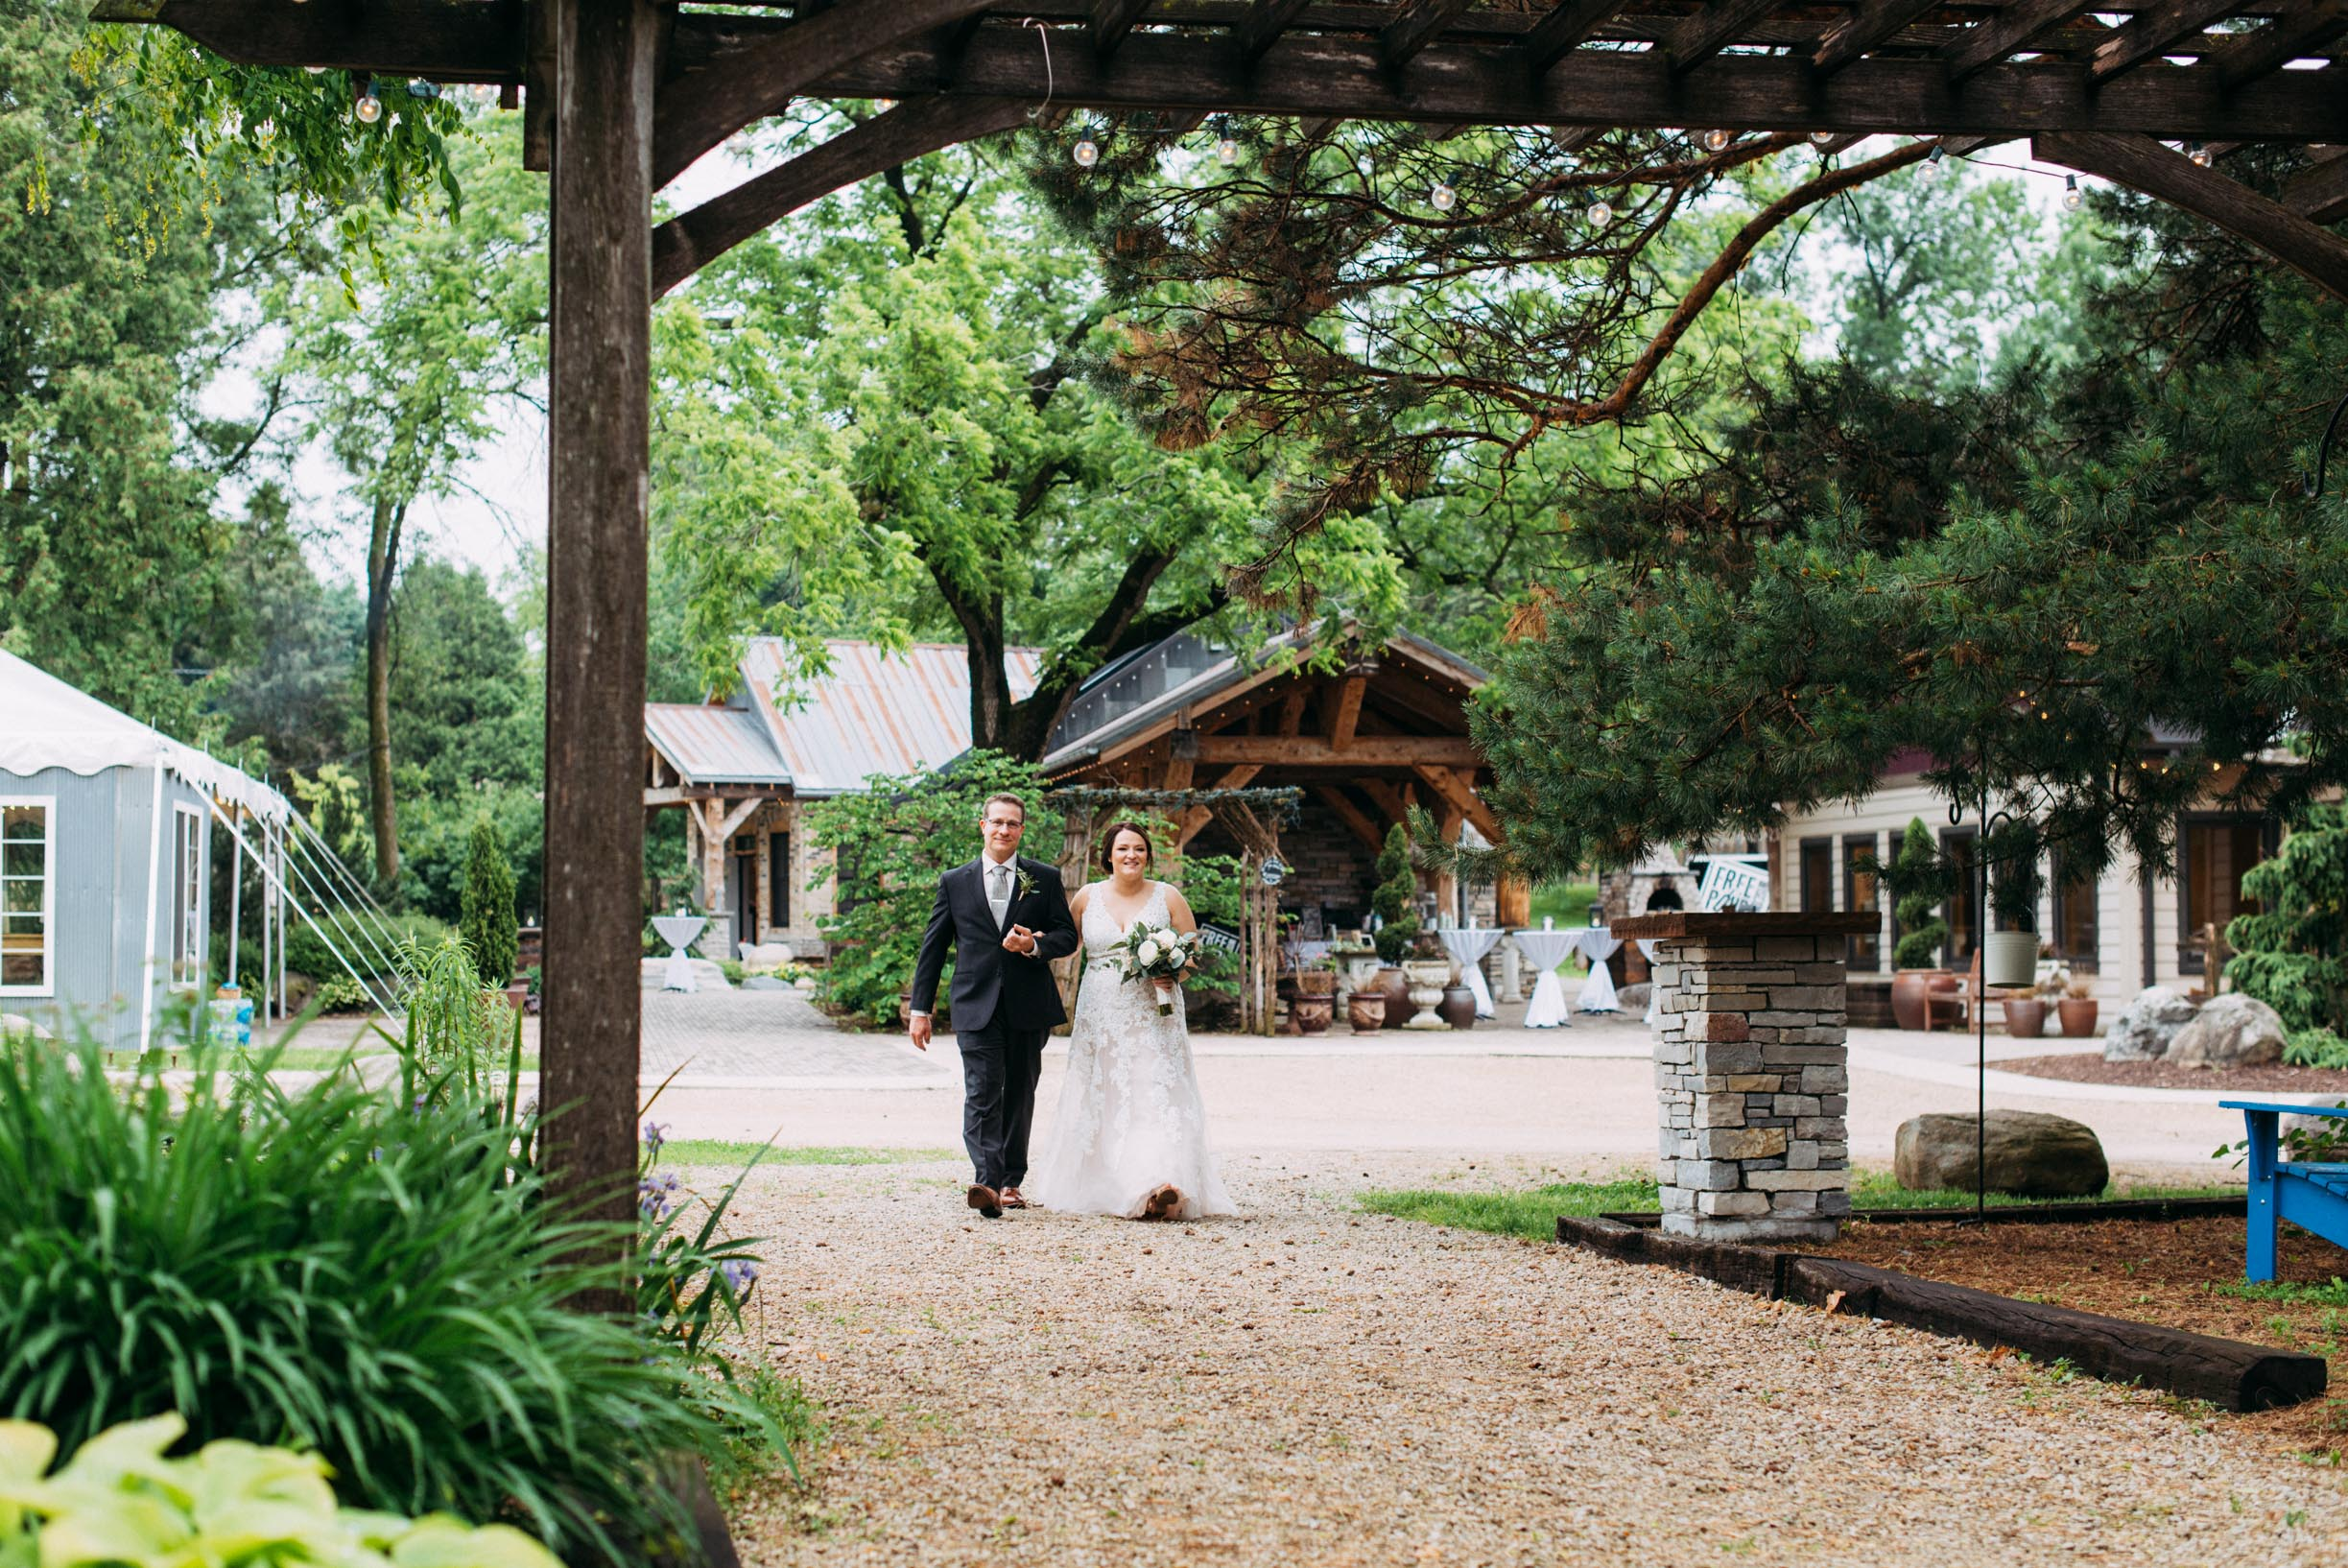 42-Jess_Jeremy_Minnesota_Wedding_Ceremony.jpg